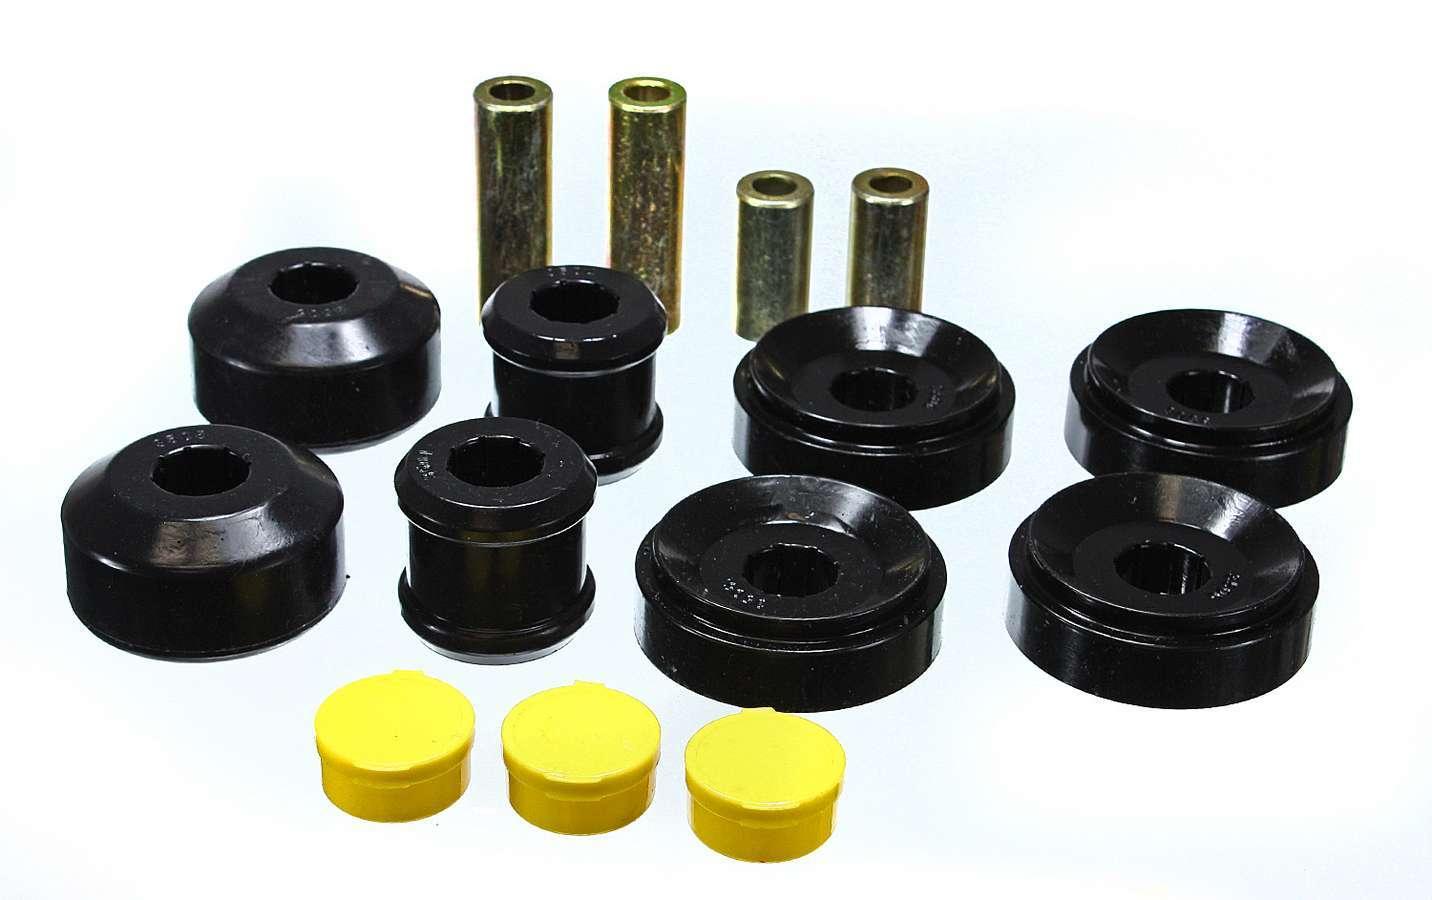 Energy Suspension 3-3195G Control Arm Bushing, Hyper-Flex, Front, Lower / Upper, Polyurethane, Black, Chevy Camaro 2010-12, Kit